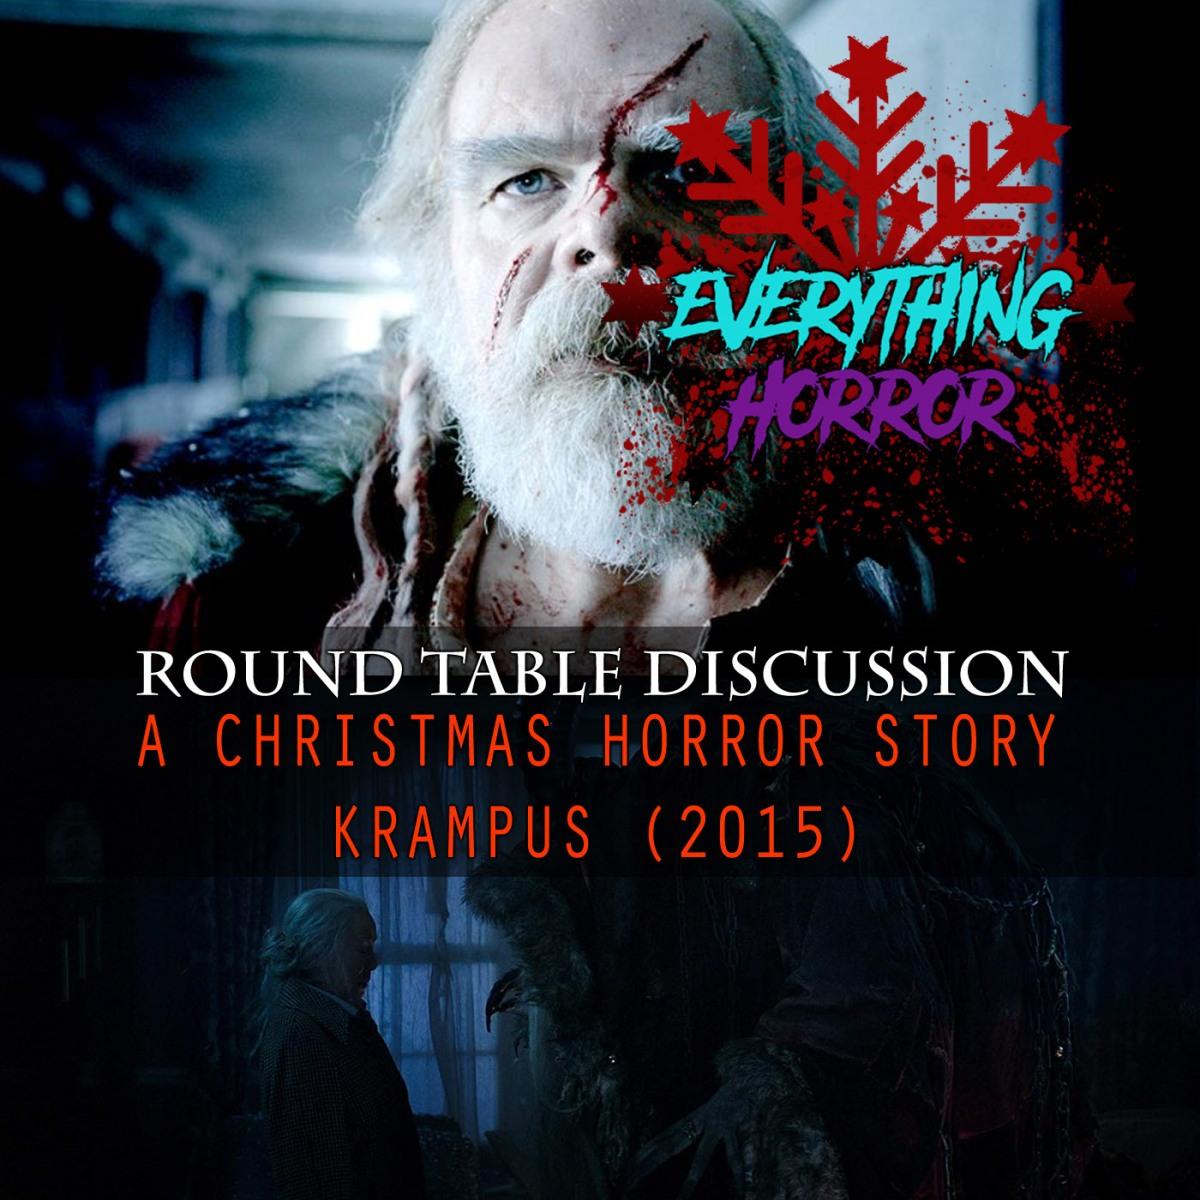 Christmas Horror Story 2015 Name